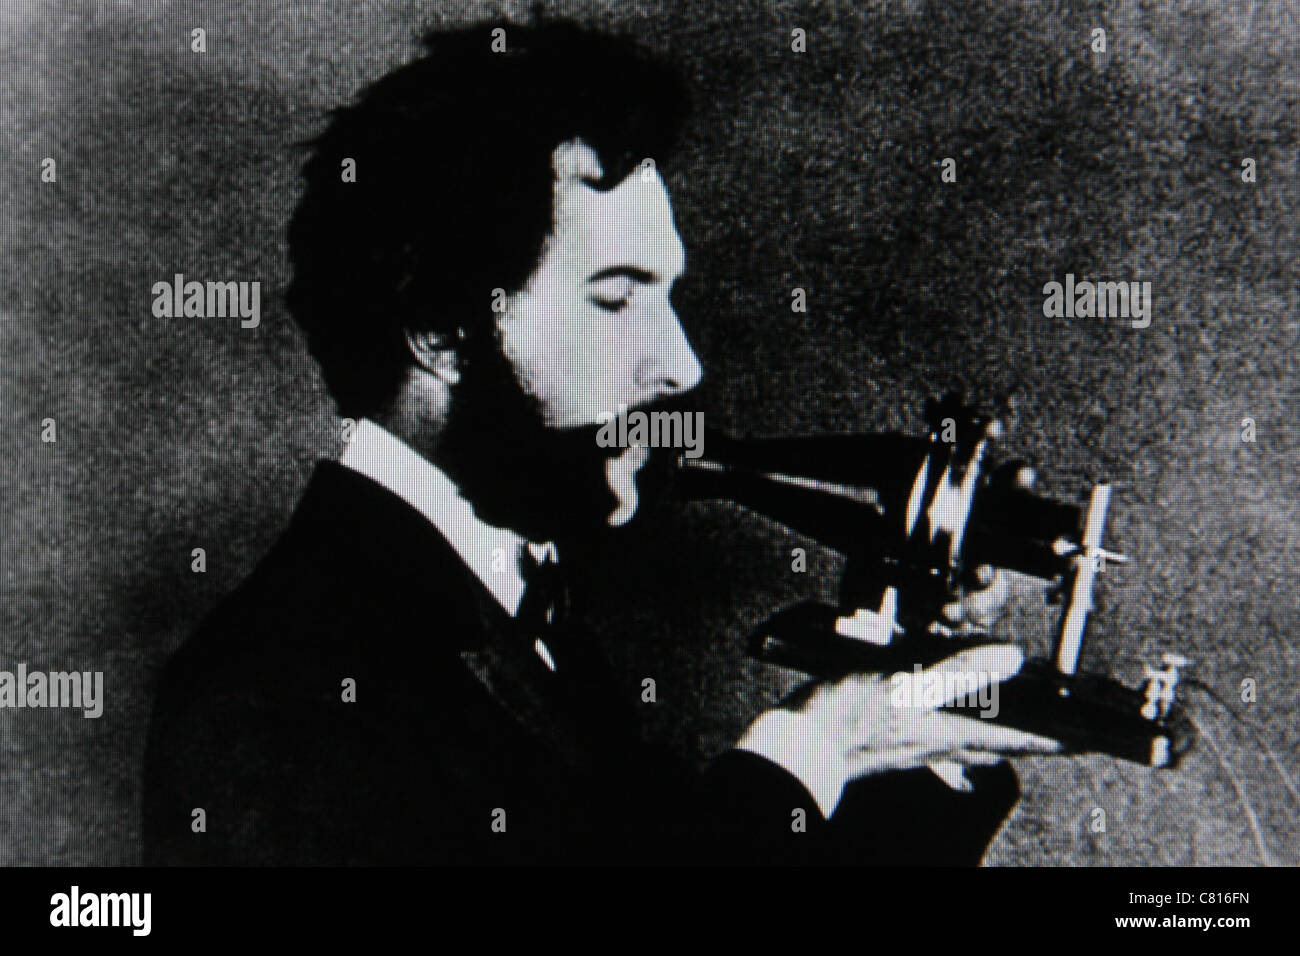 Alexander Graham Bell phone inventor - Stock Image